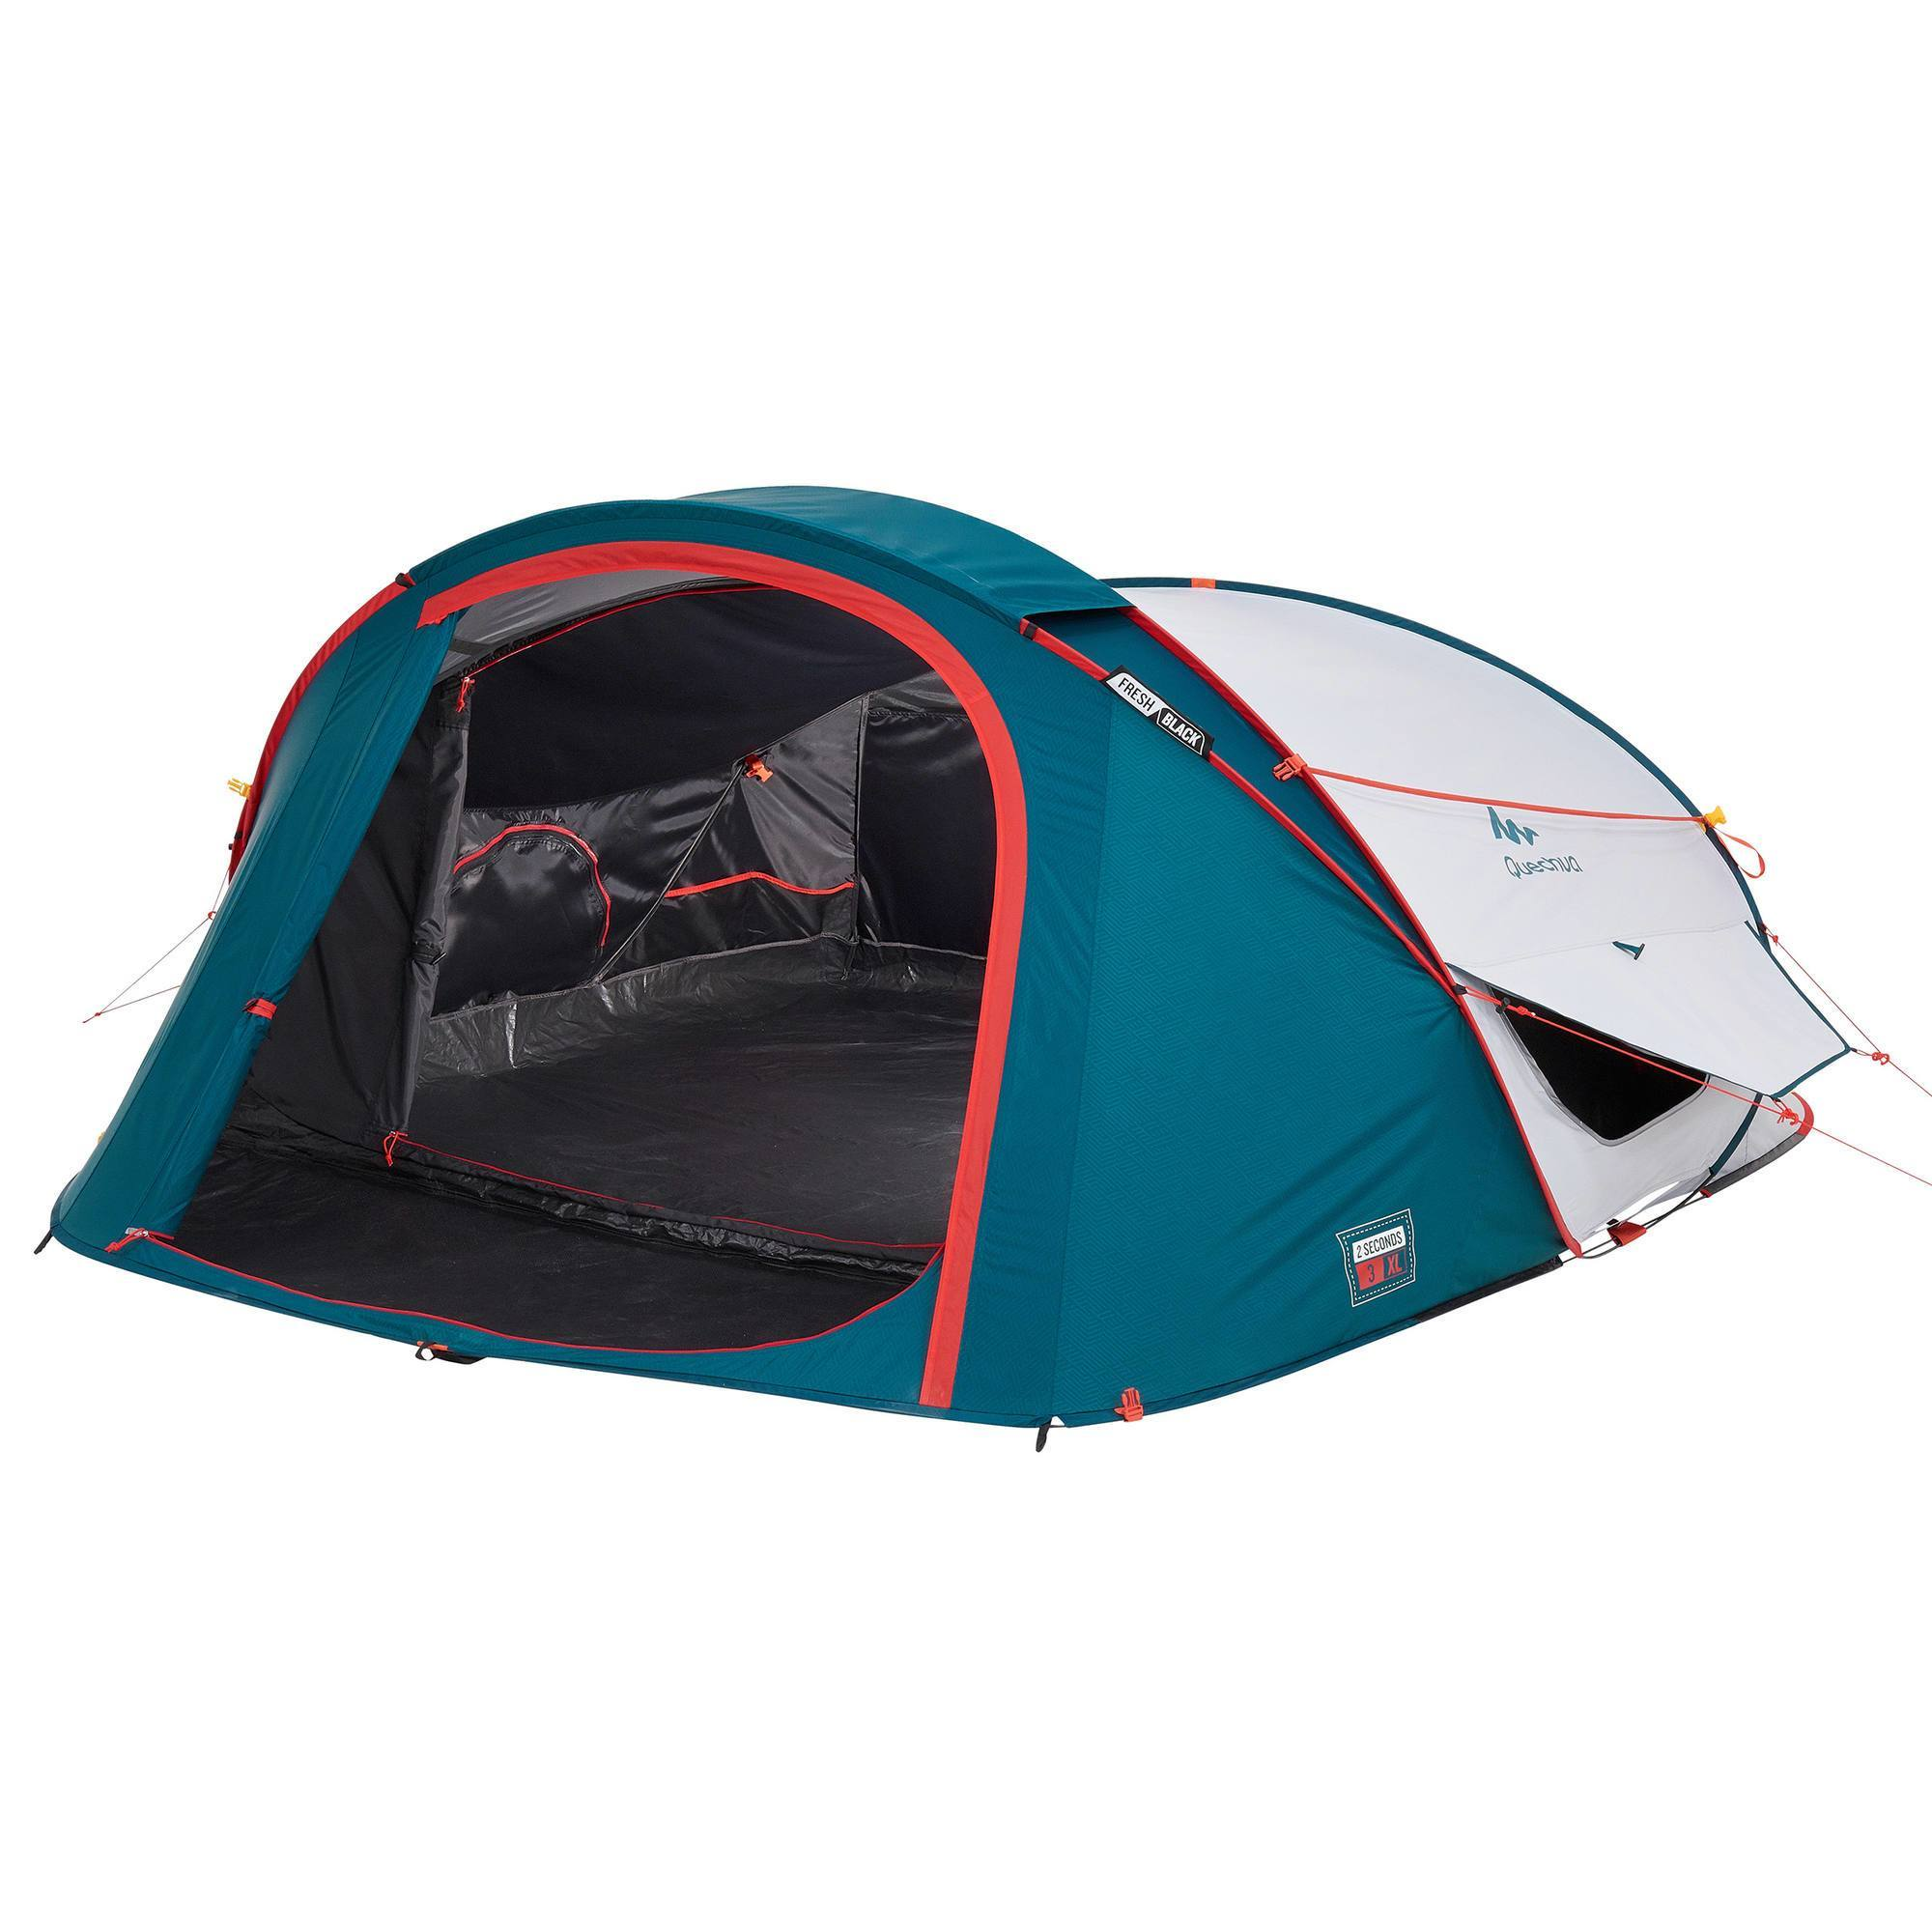 tente de camping 2 seconds 3 xl fresh black 3 personnes blanche clubs collectivit s. Black Bedroom Furniture Sets. Home Design Ideas